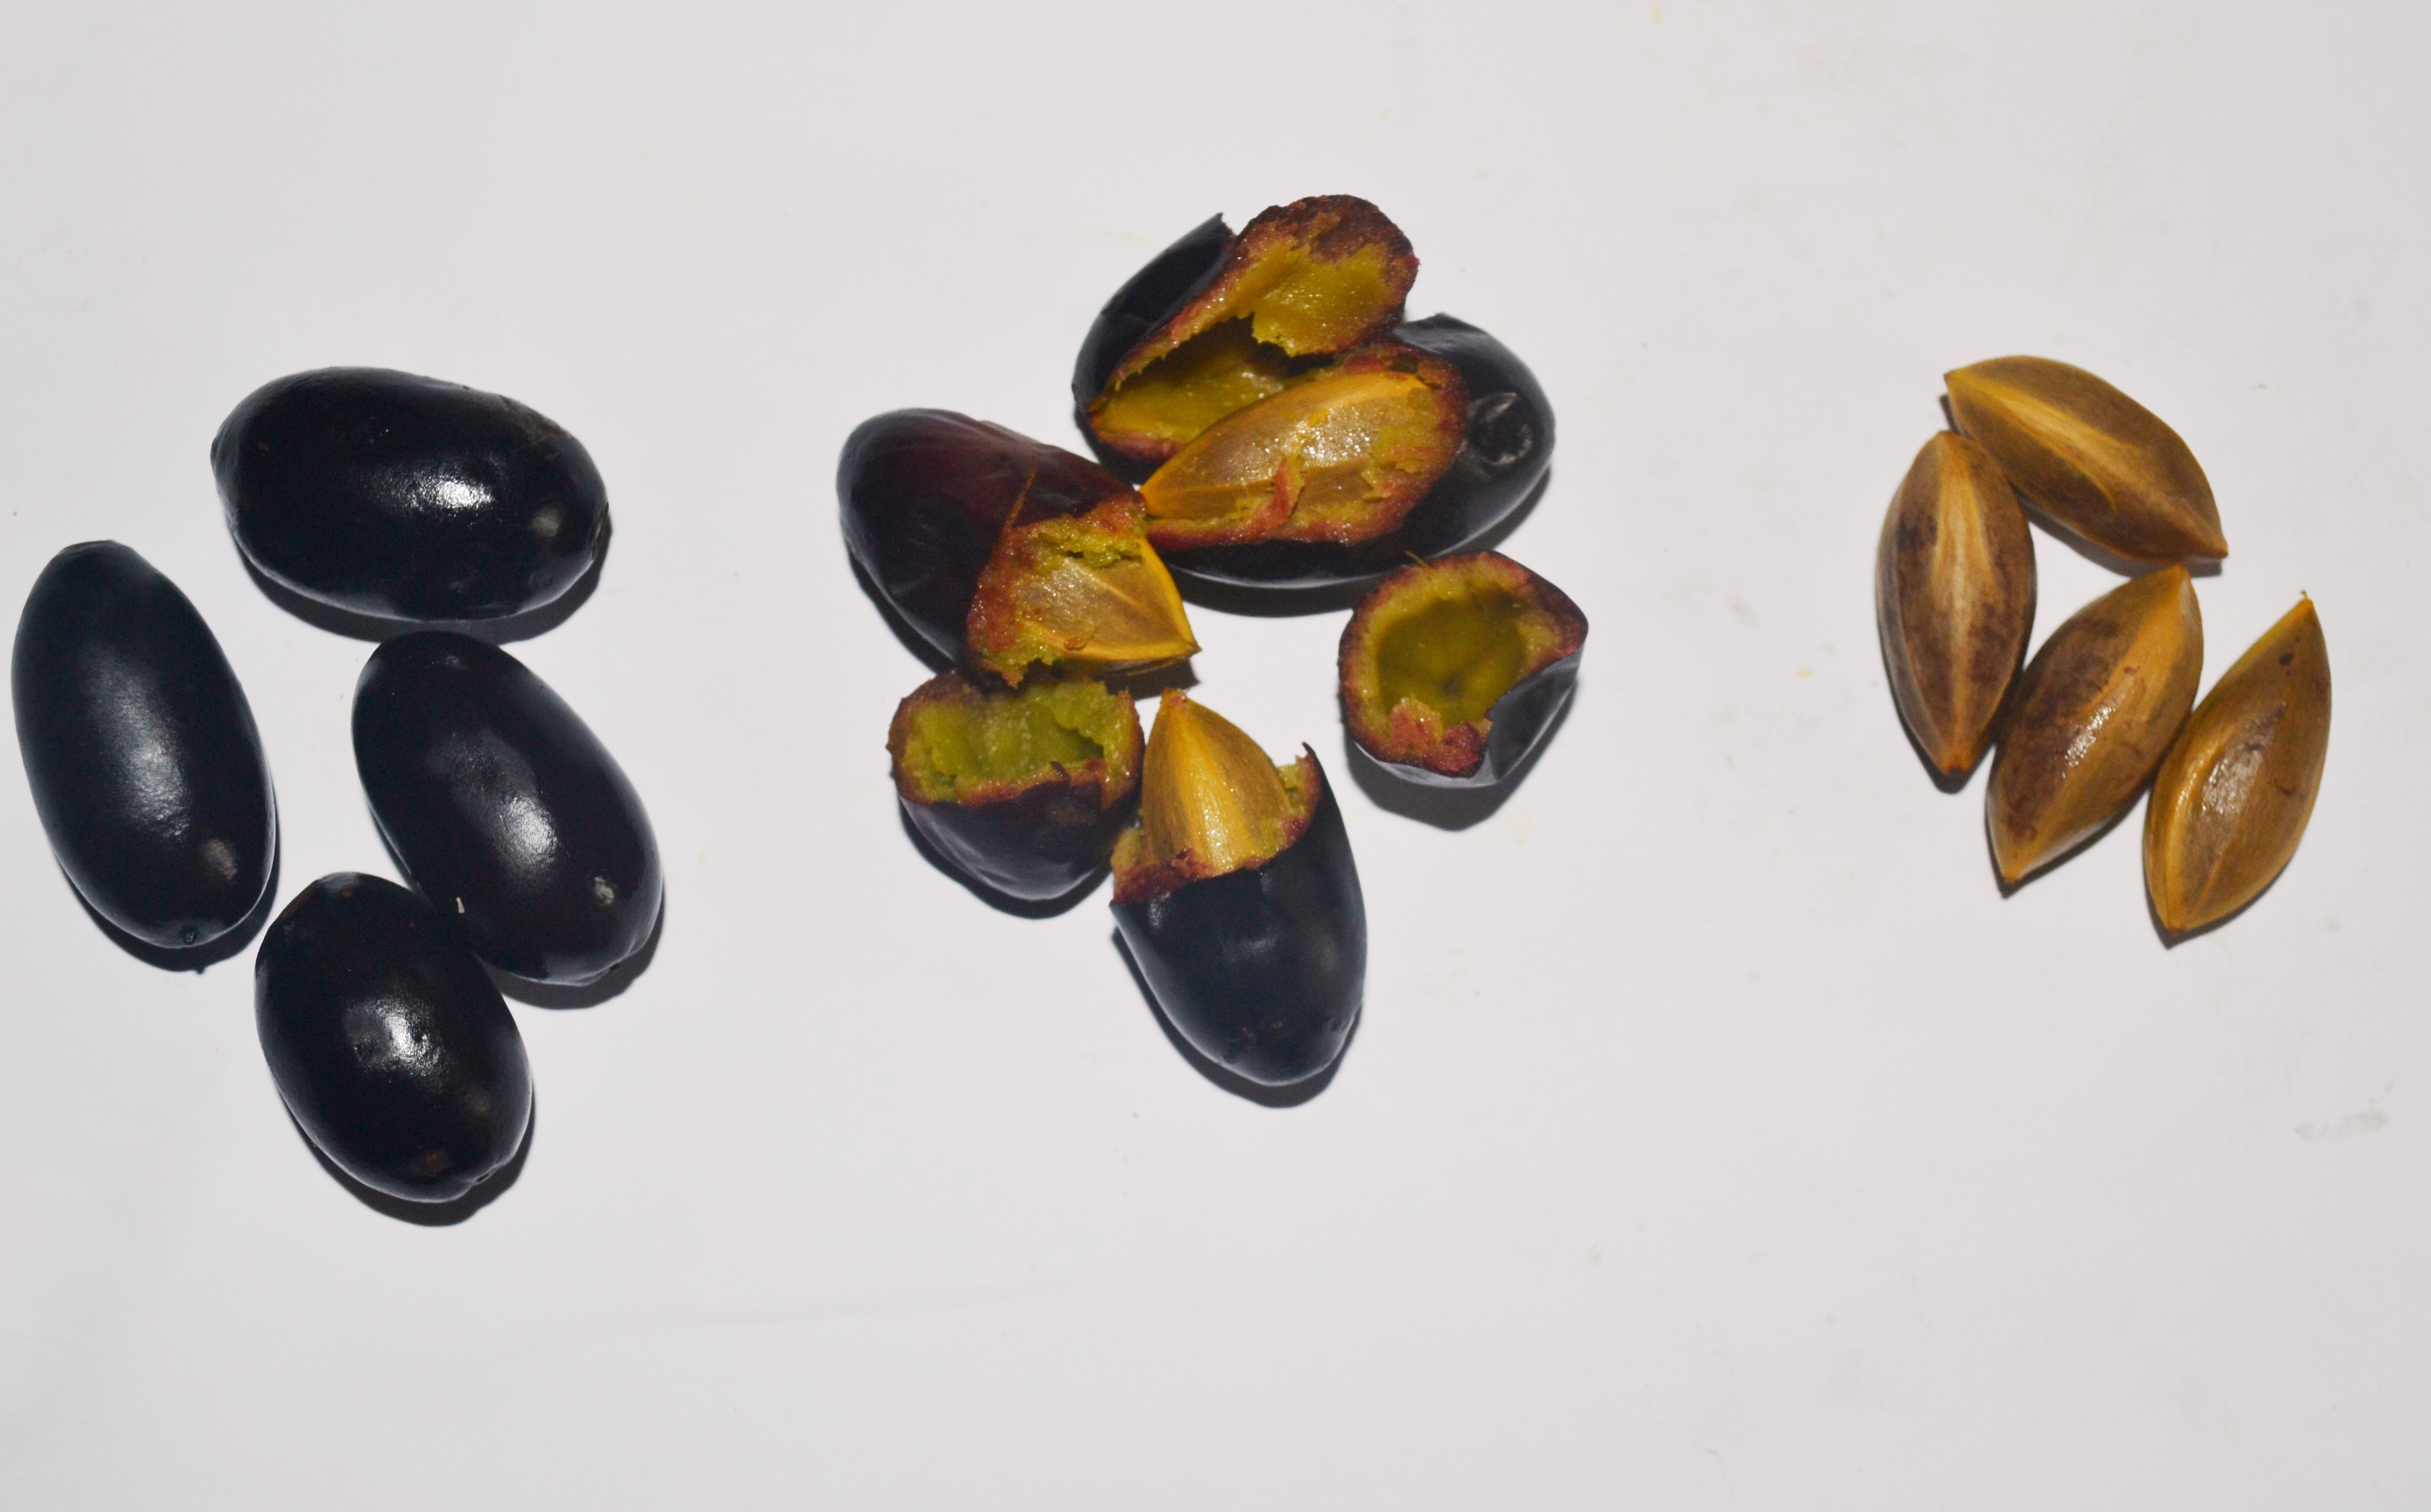 file fruit pulpe et noyau du canarium wikimedia commons. Black Bedroom Furniture Sets. Home Design Ideas